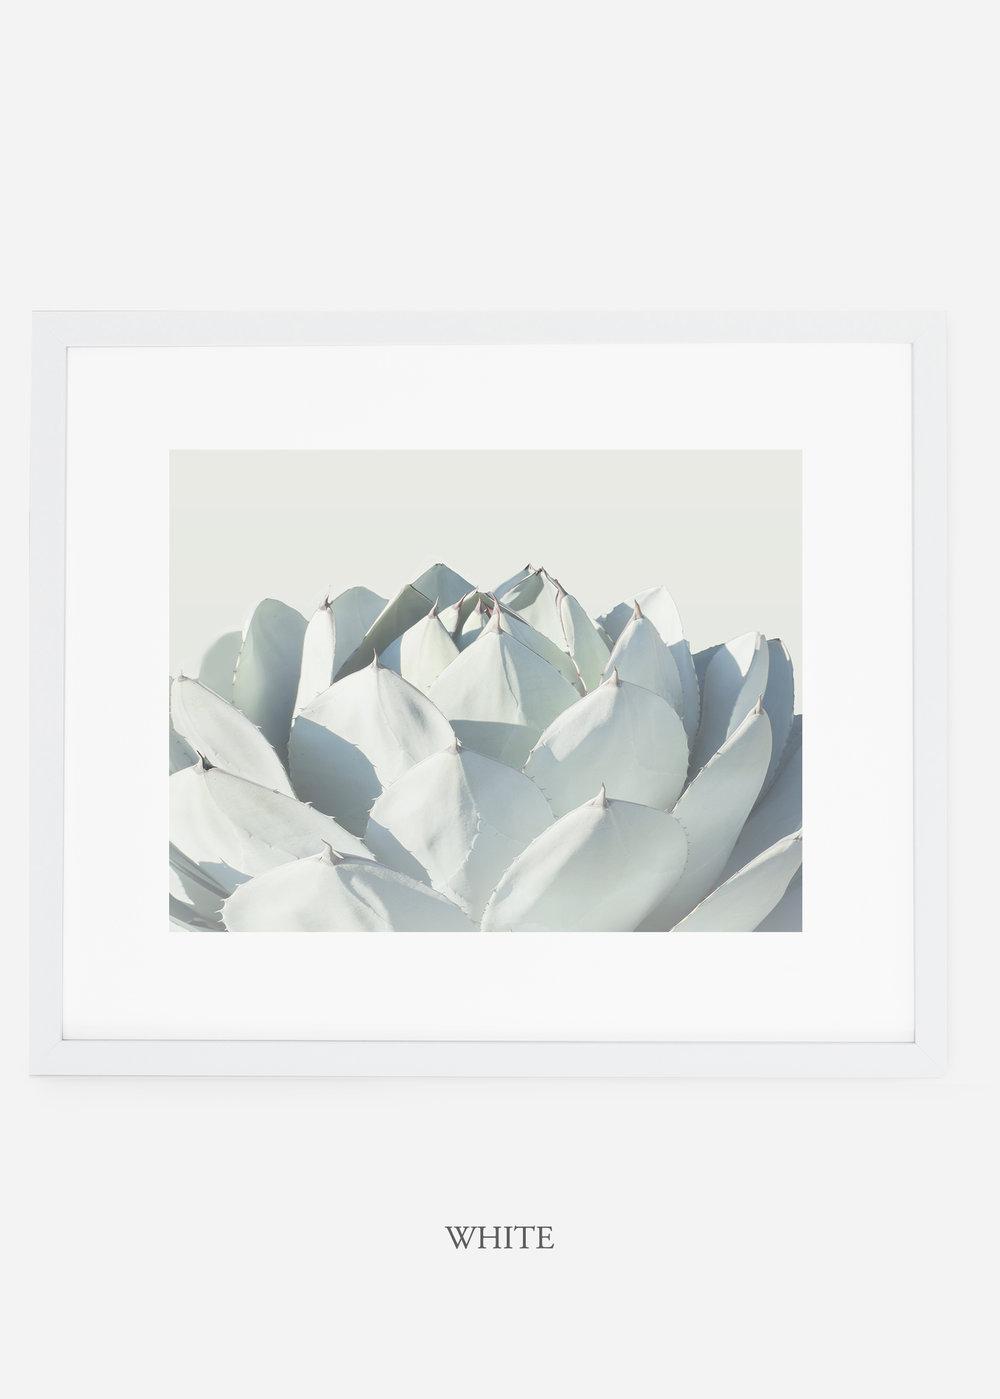 WilderCalifornia_whiteframe_Cactus_Art_Photography_interiordesign_white_bohemian_neutral_photography_photo.jpg